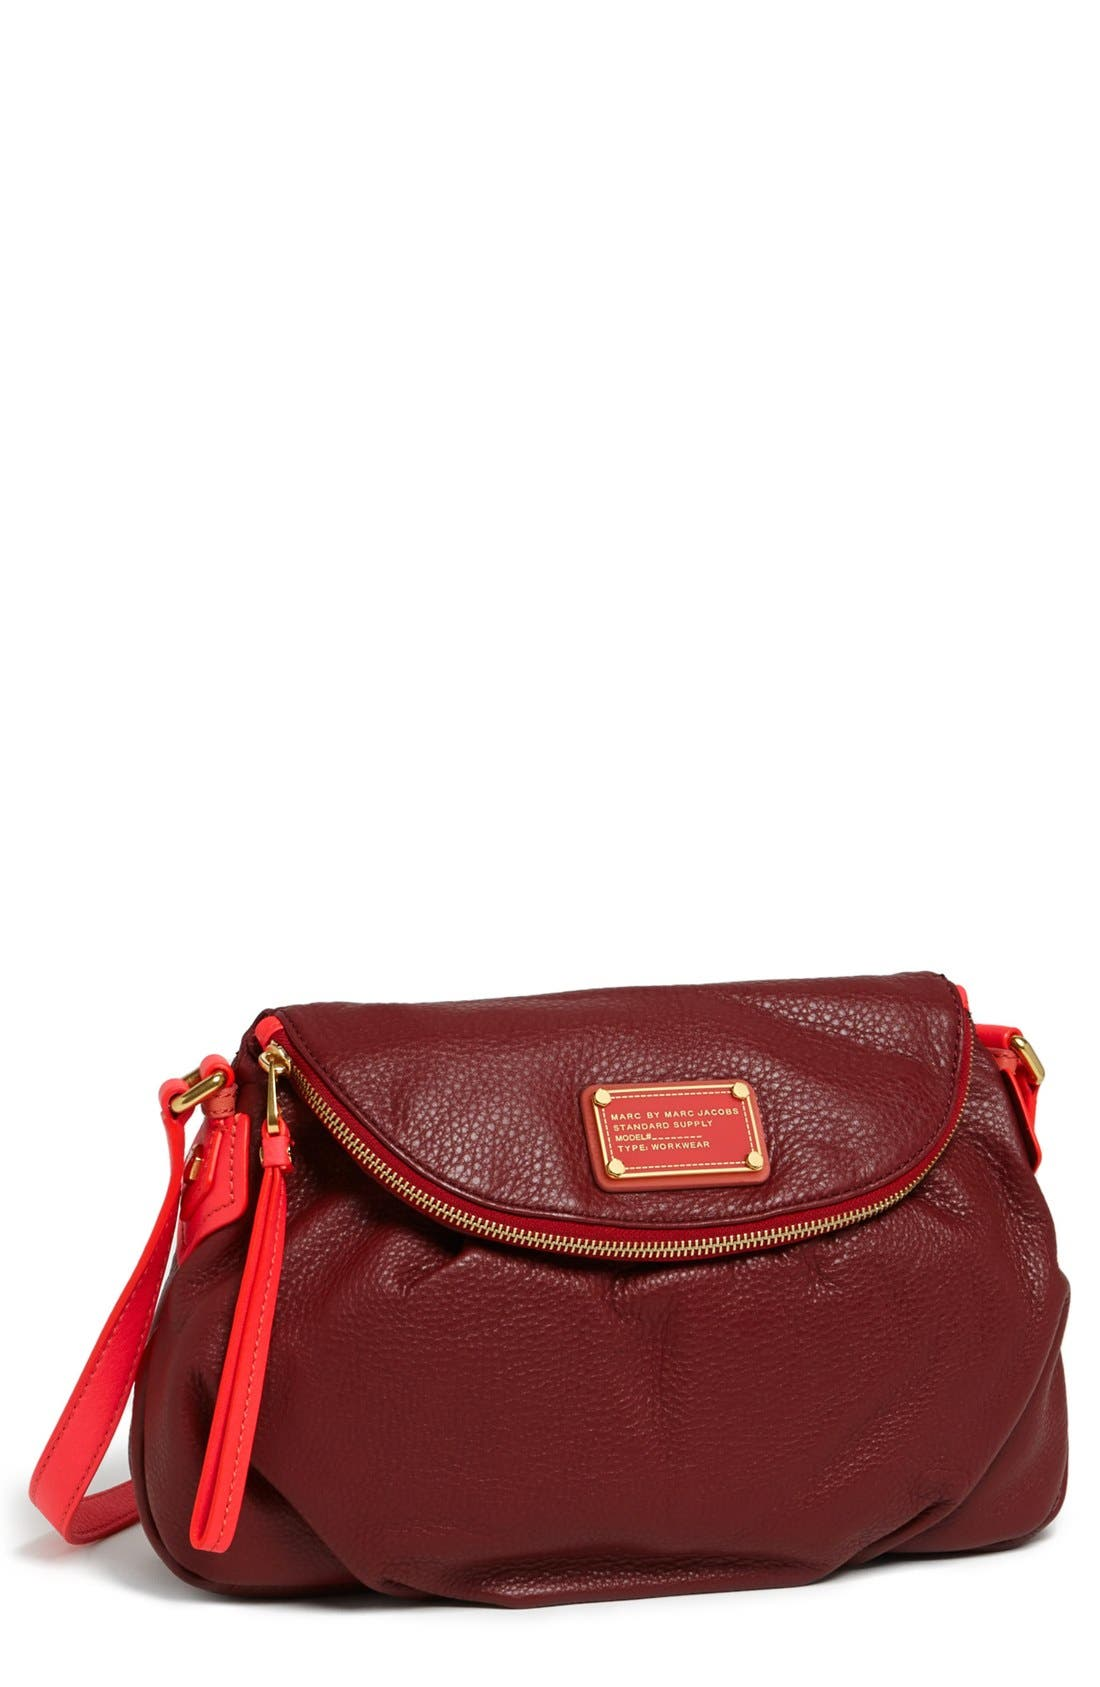 Main Image - MARC BY MARC JACOBS 'Classic Q - Natasha' Leather Crossbody Bag